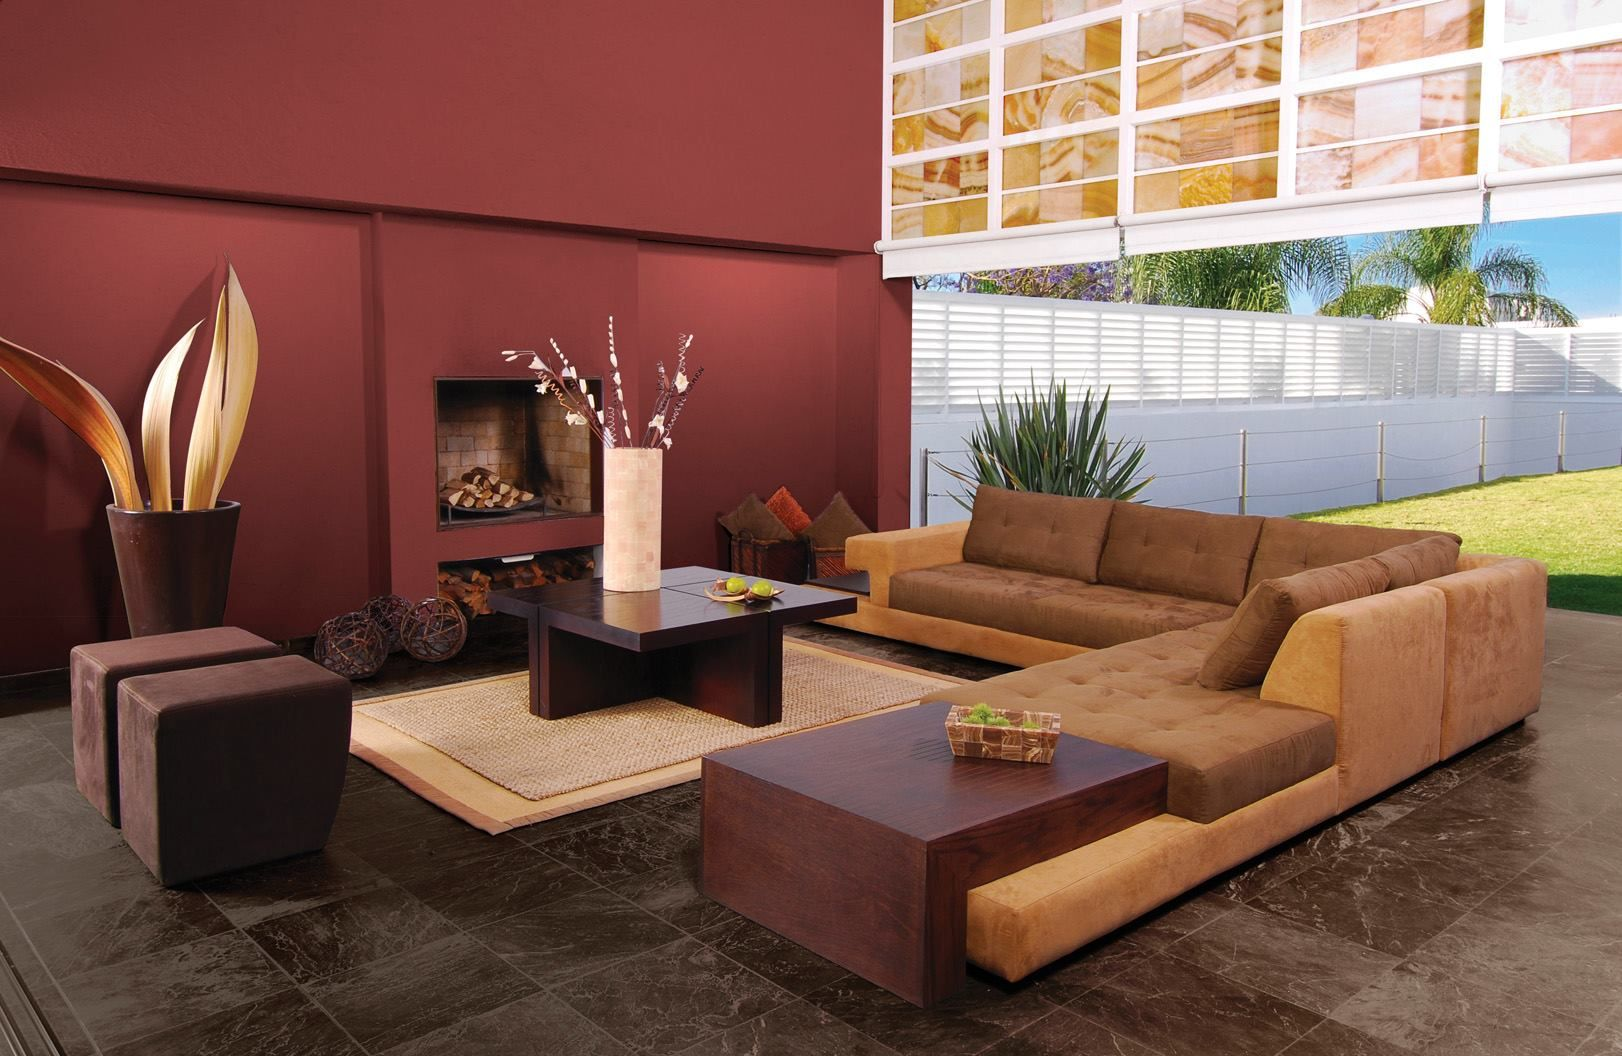 paredes terracota | Sala y comedor | Pinterest | Terracota ...